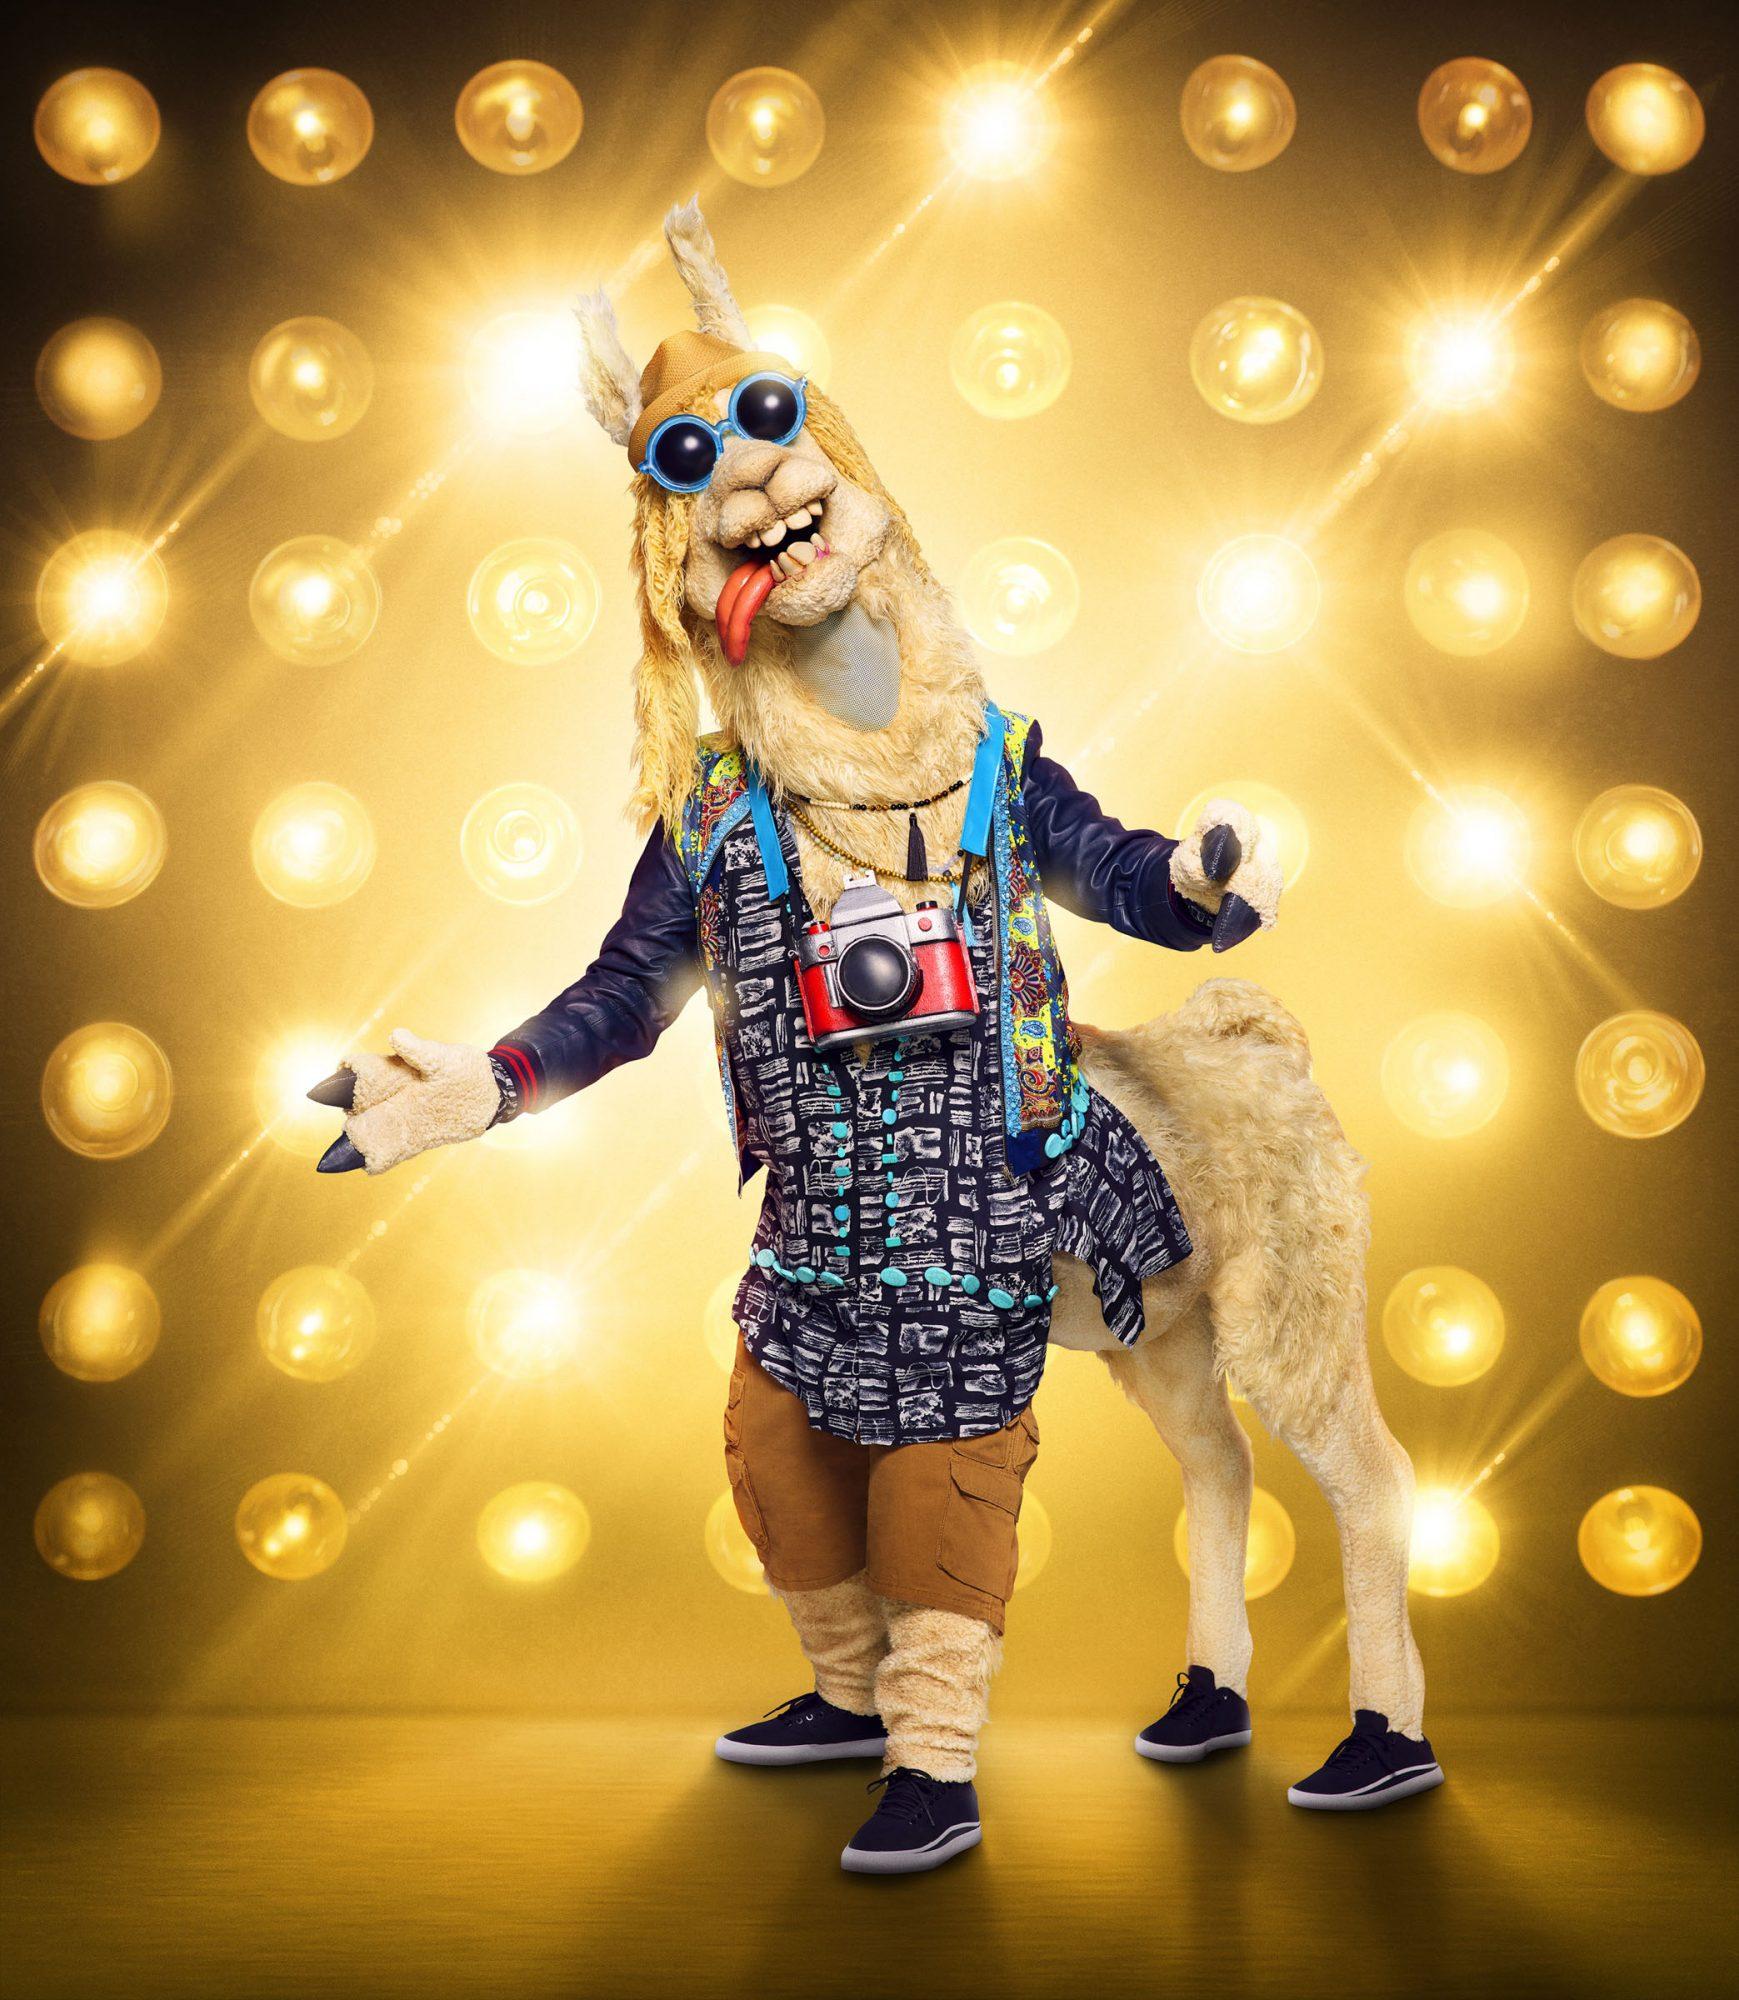 THE MASKED SINGER: The Llama. CR: Michael Becker / FOX. © 2020 FOX MEDIA LLC.